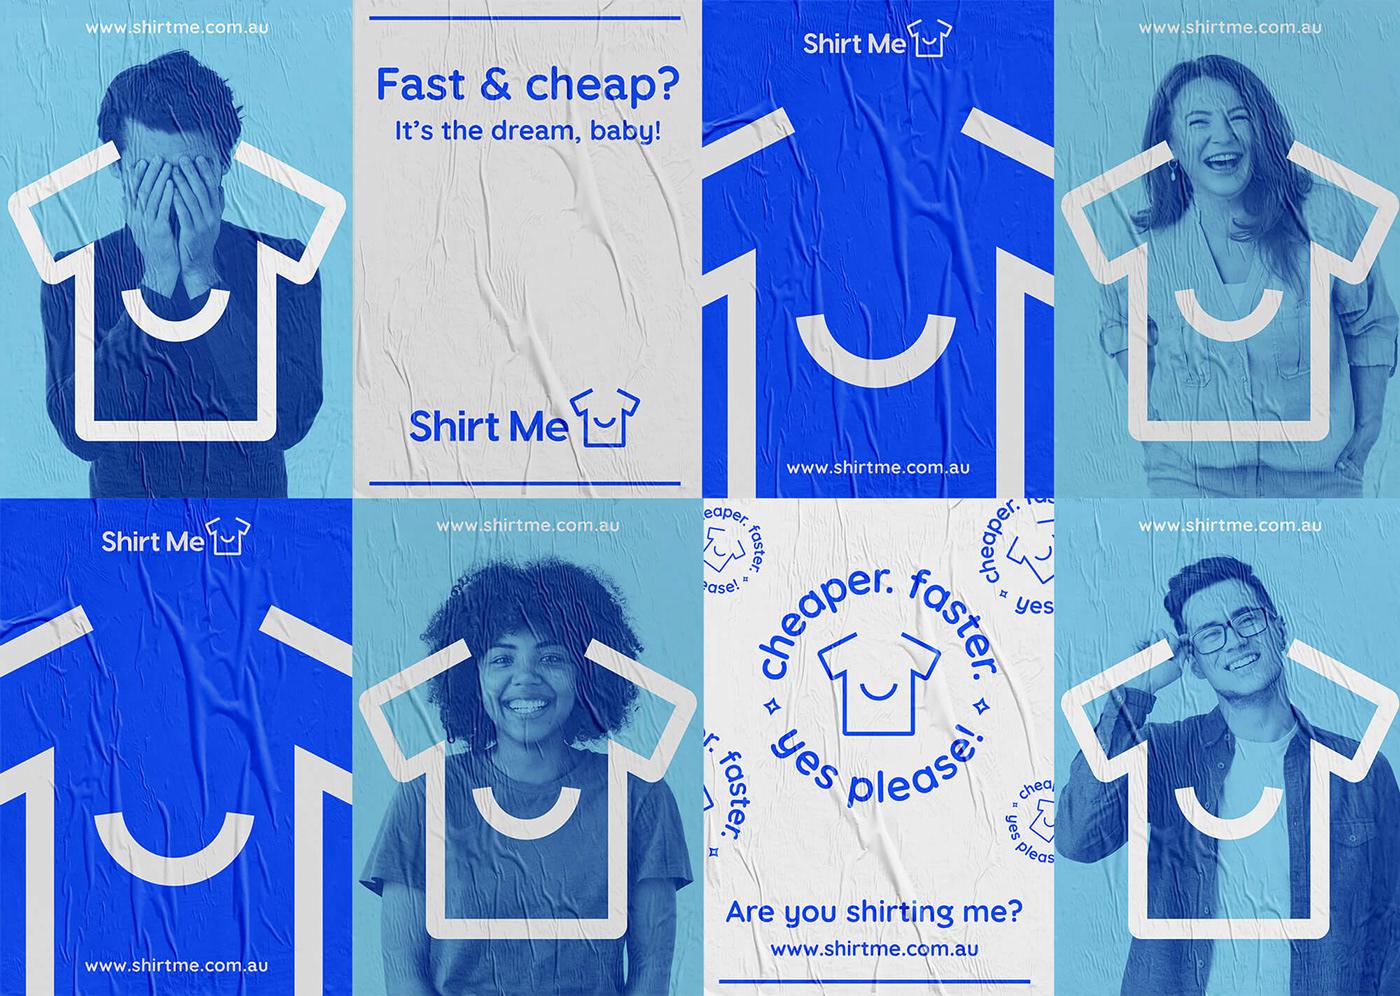 apparel Clothing garment Printing screen printing t-shirt tee tee shirt